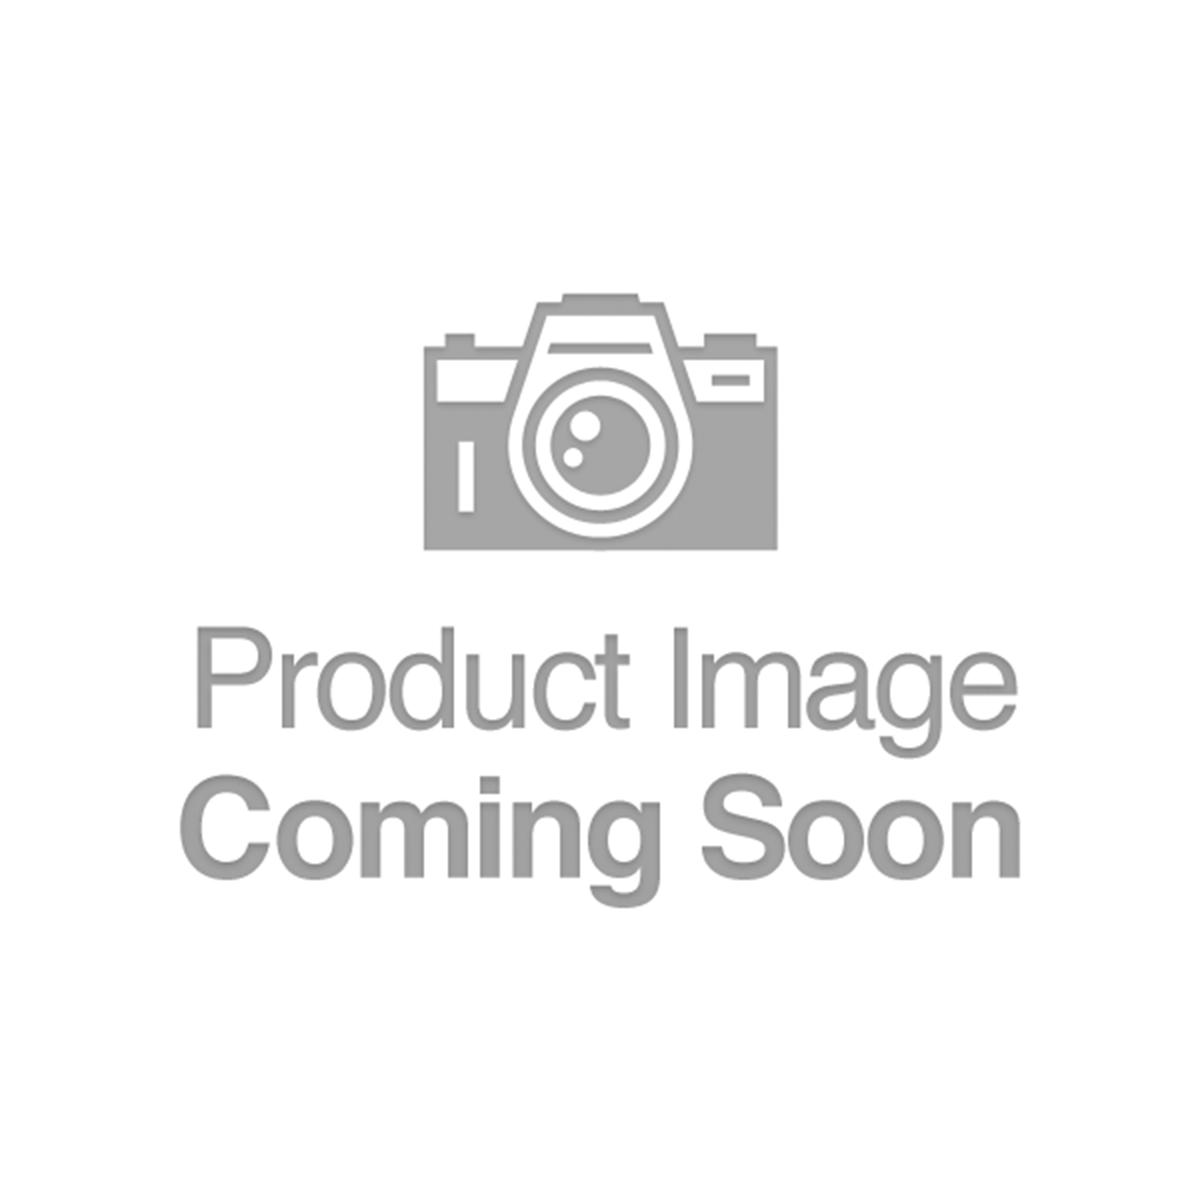 C Bechtler $1 N Reversed Bechtler PCGS AU55